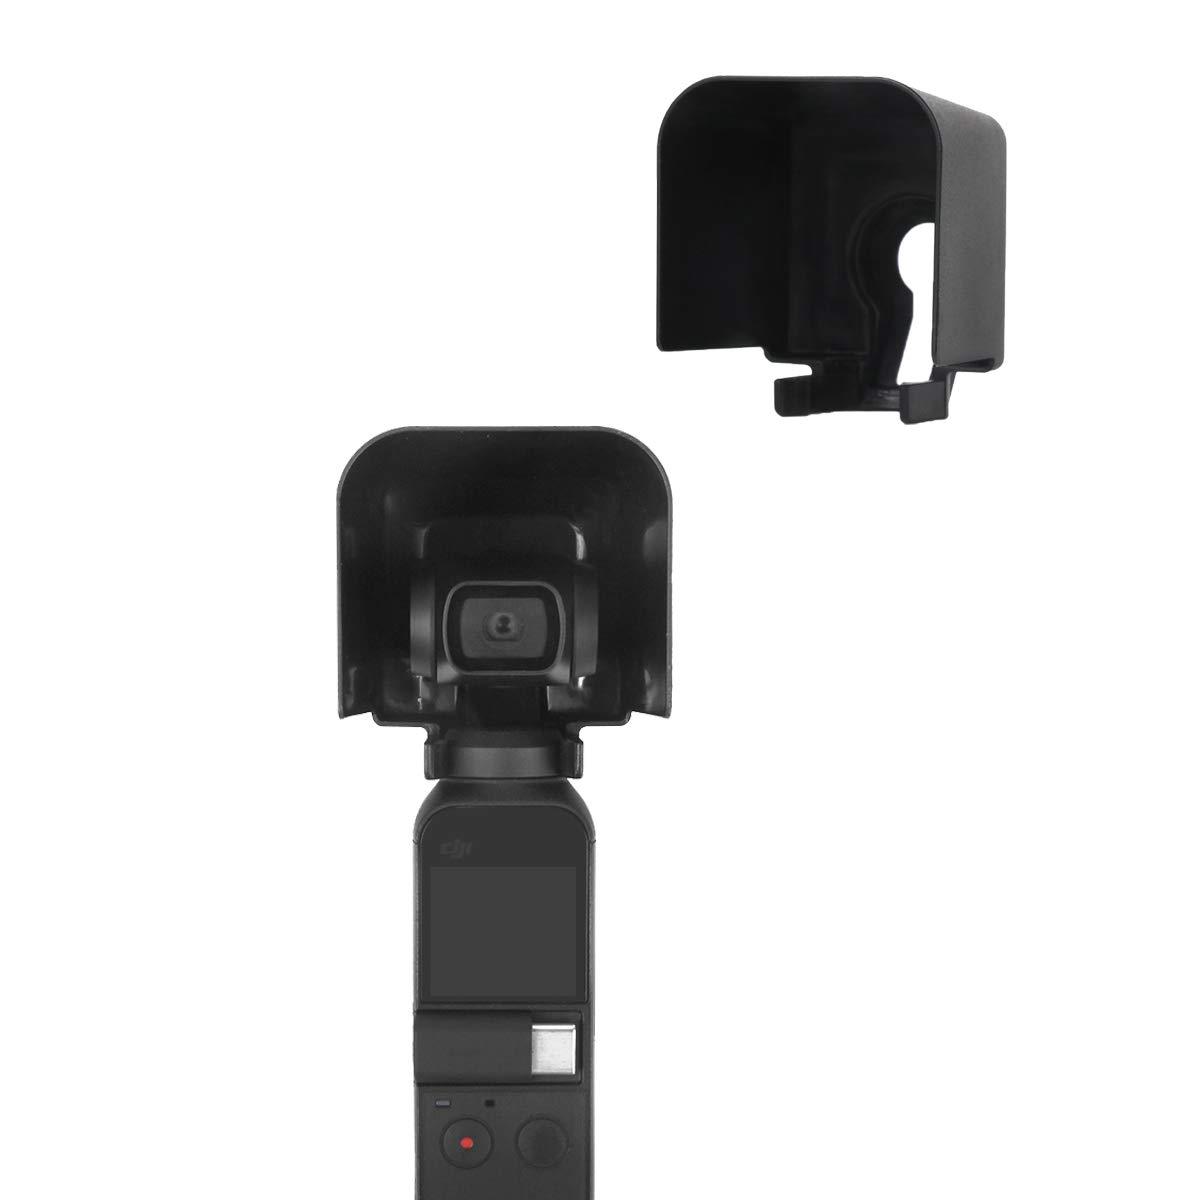 Tineer Handheld Gimbal Camera Lens Parasole copri-cap coperchio Parasole protettivo per DJI OSMO Pocket PTZ Camera Accessorio